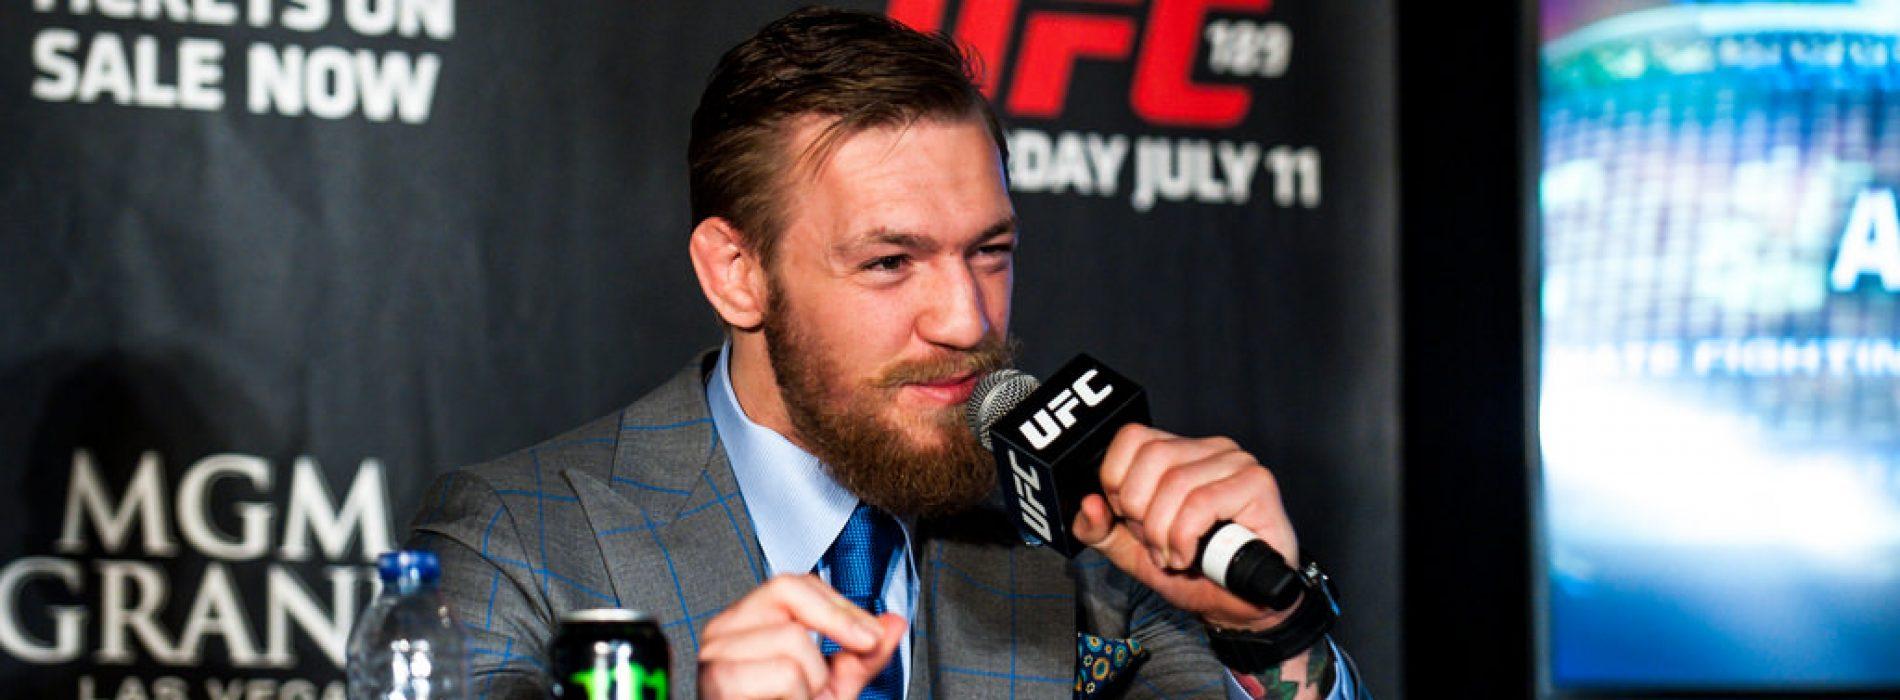 Fancy a Flutter on McGregor V Mayweather? Here are the Odds